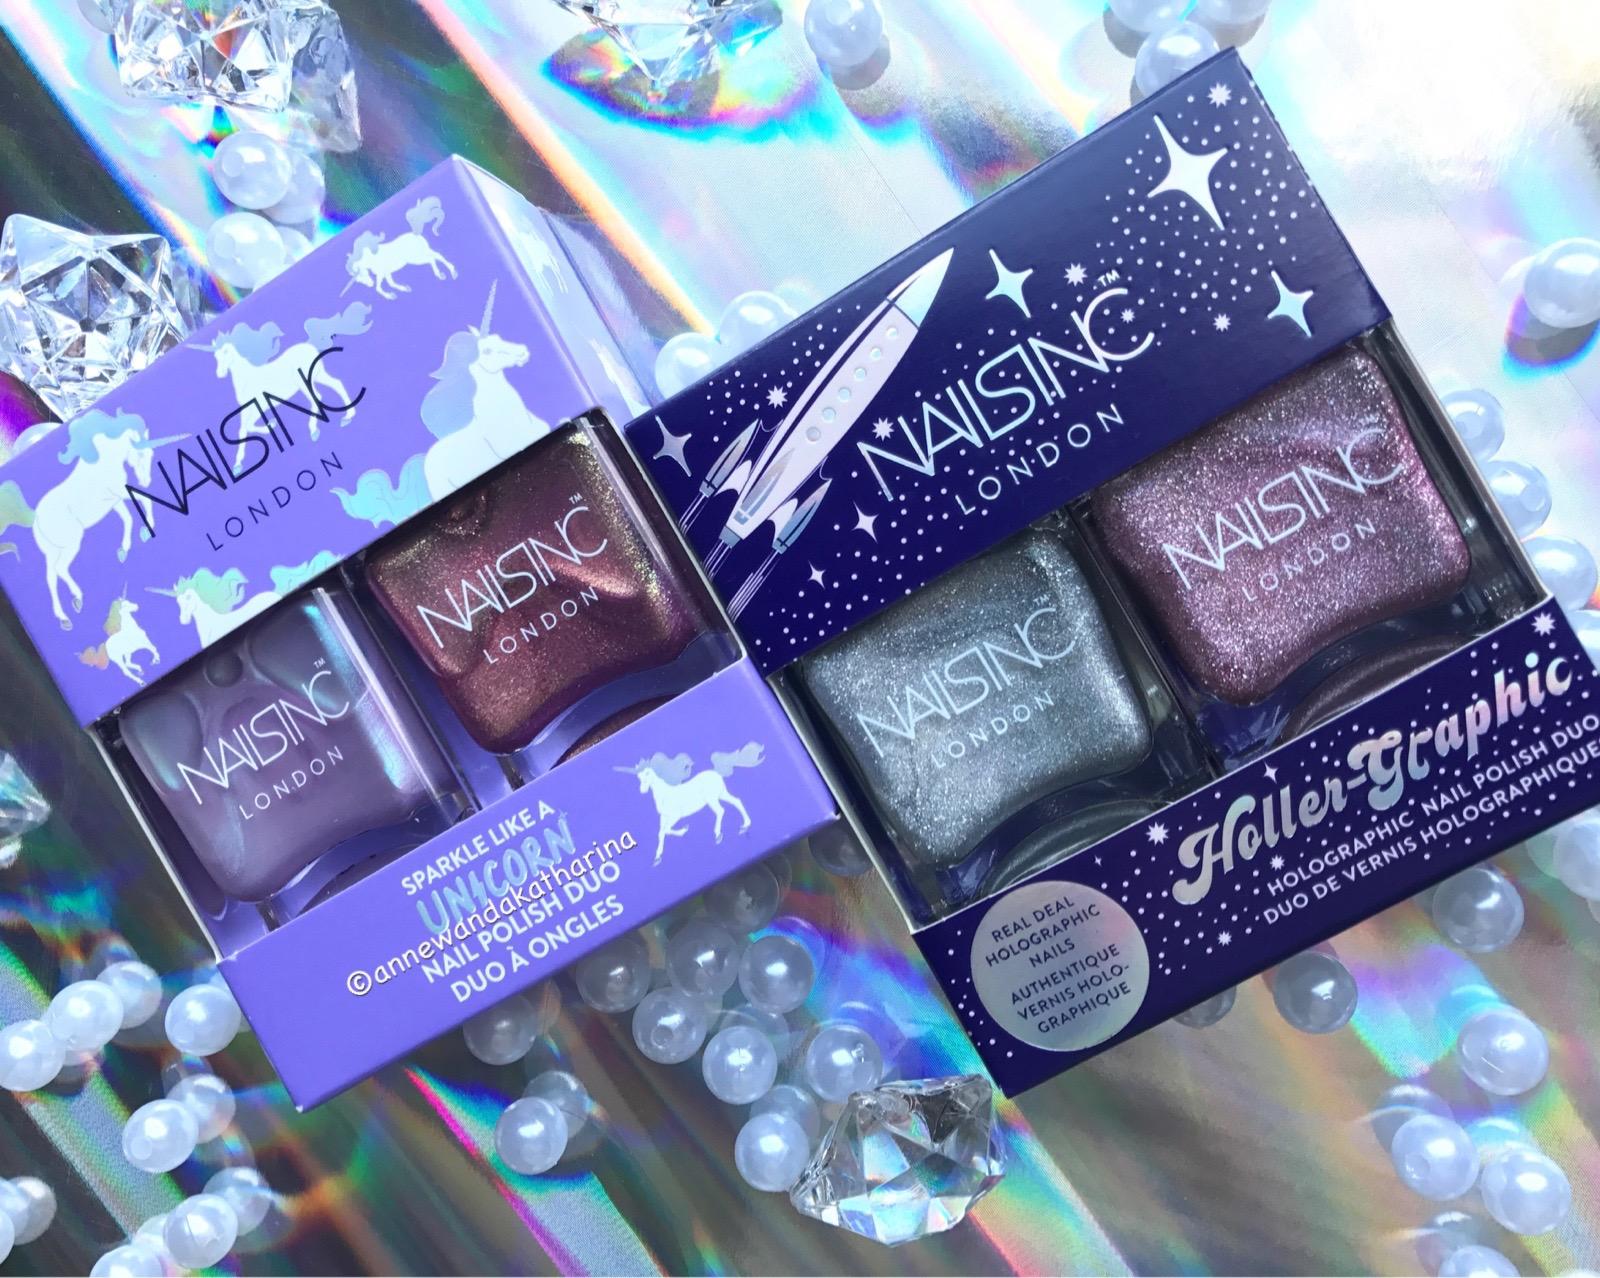 annewandakatharina: NailsInc Sparkle Like A Unicorn & Holler-Graphic Set